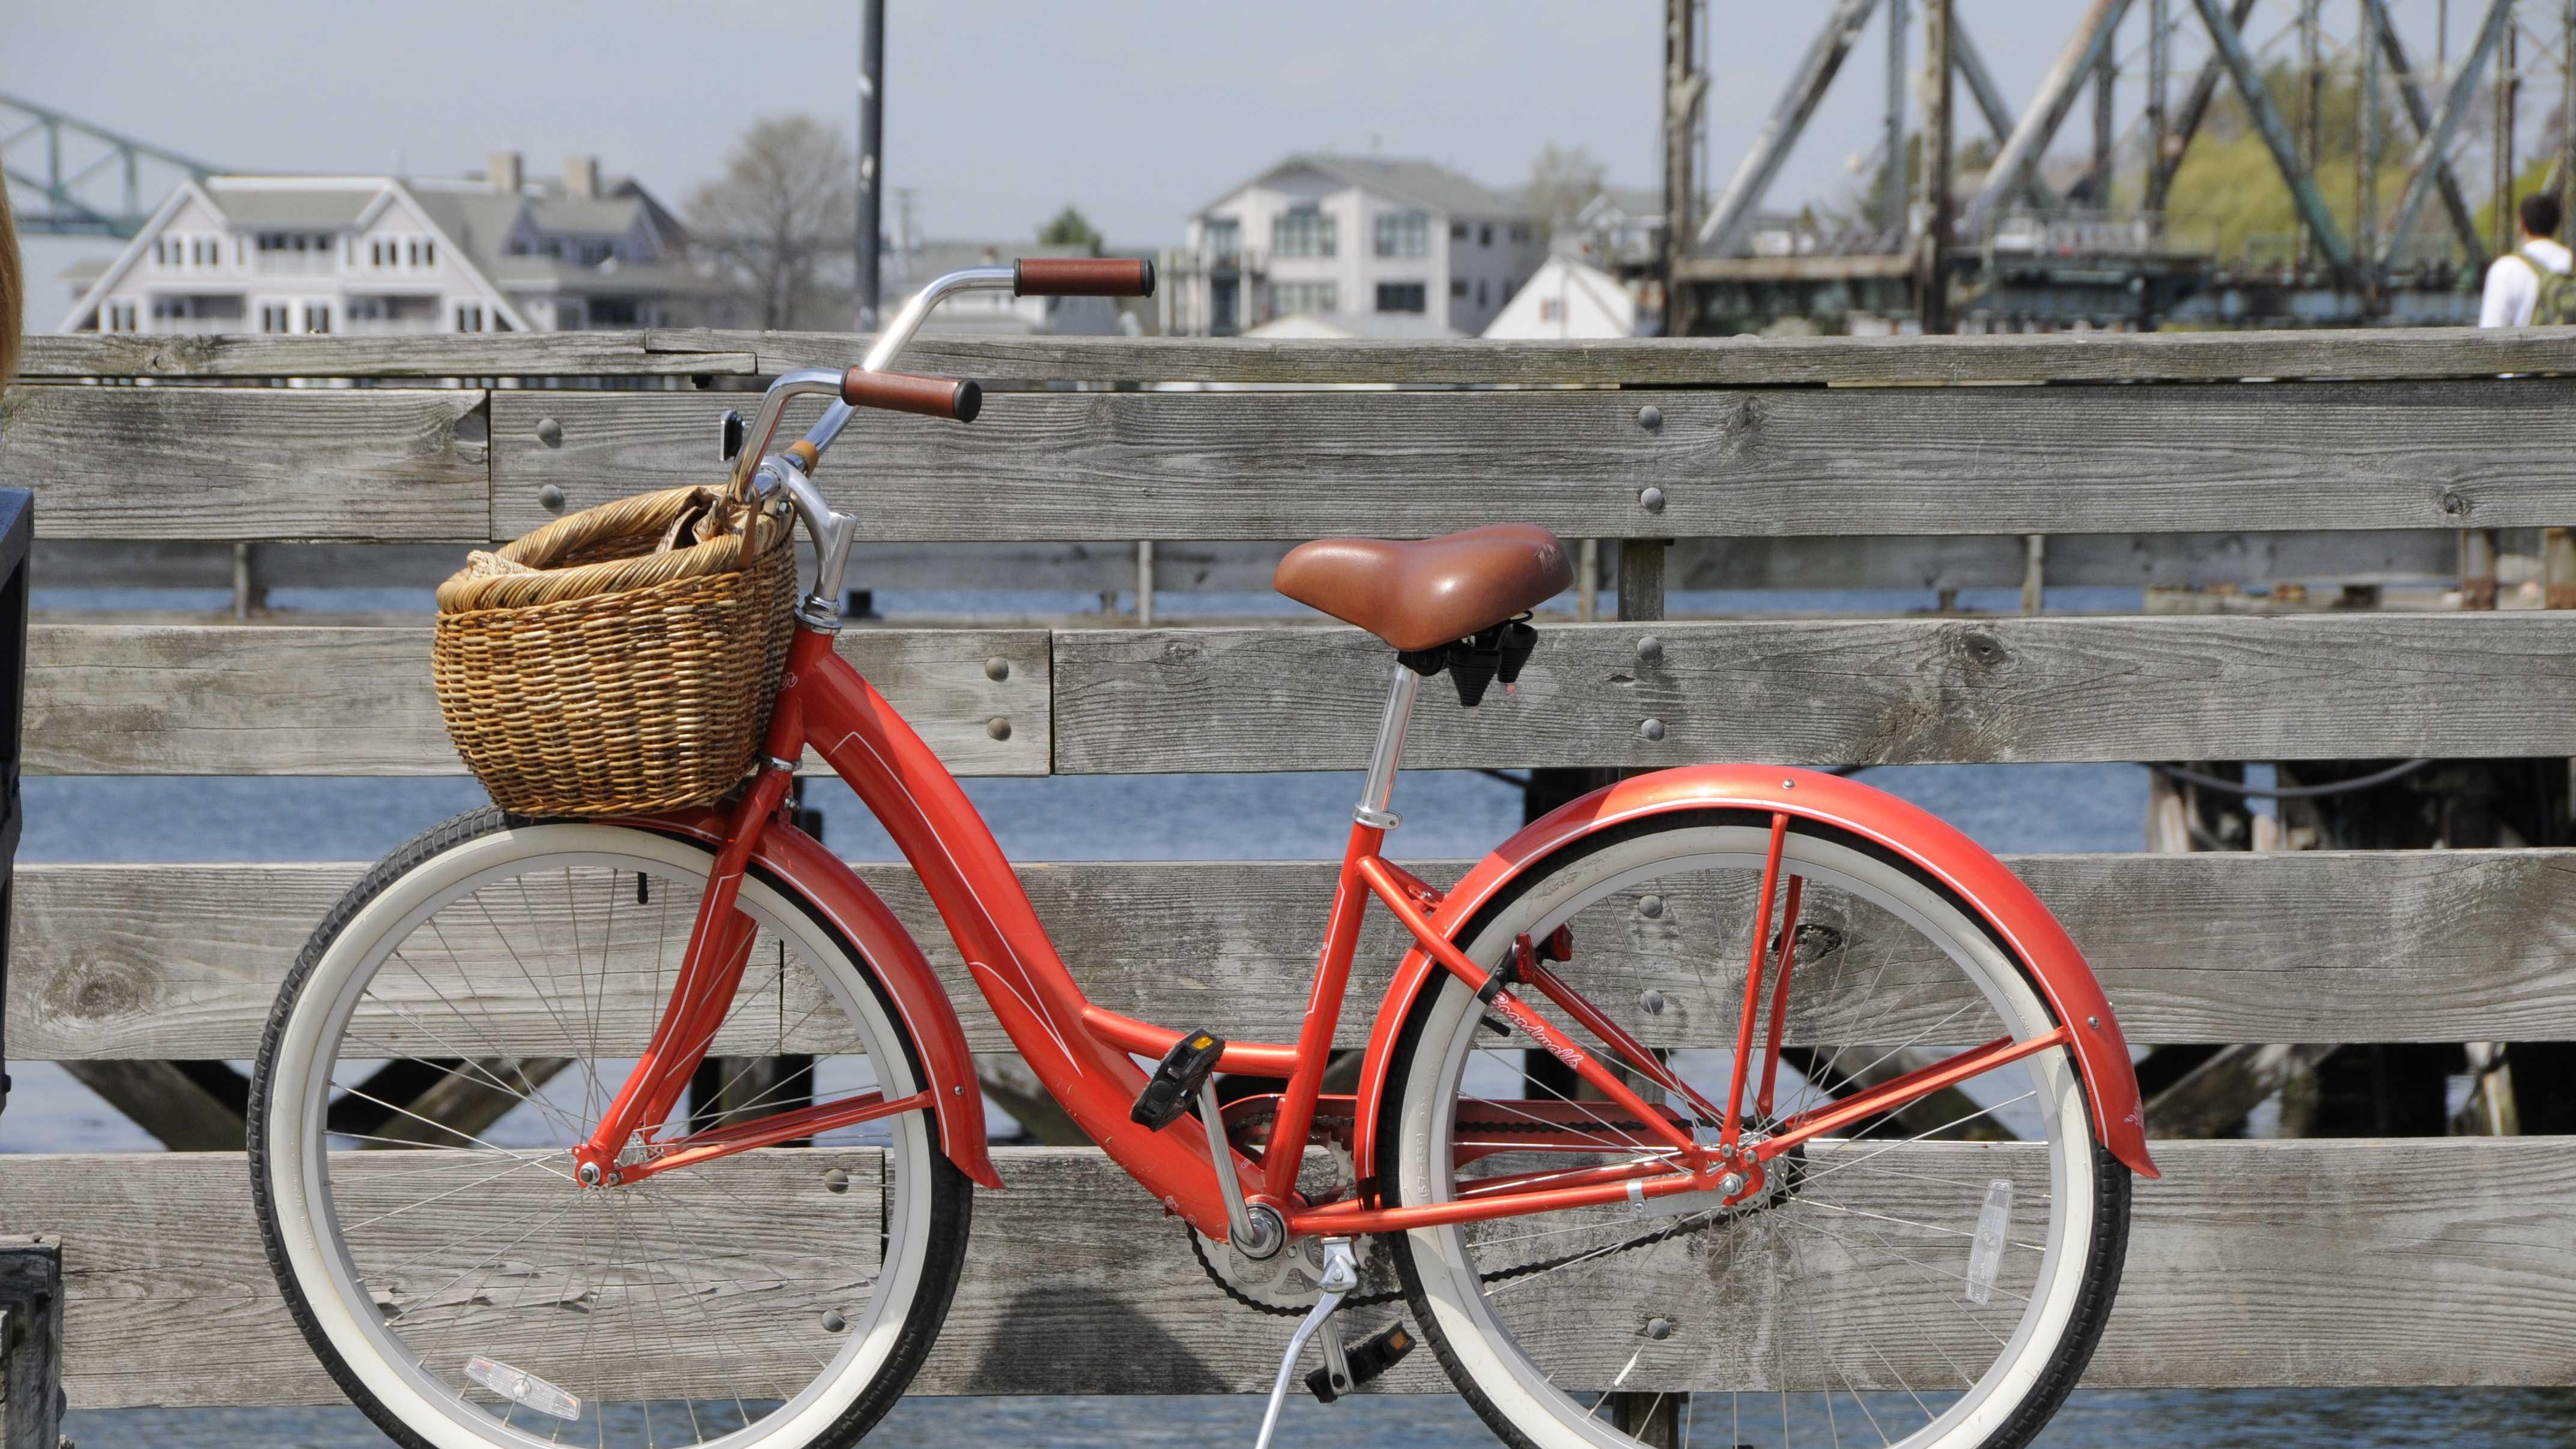 Bike, bicycle generic